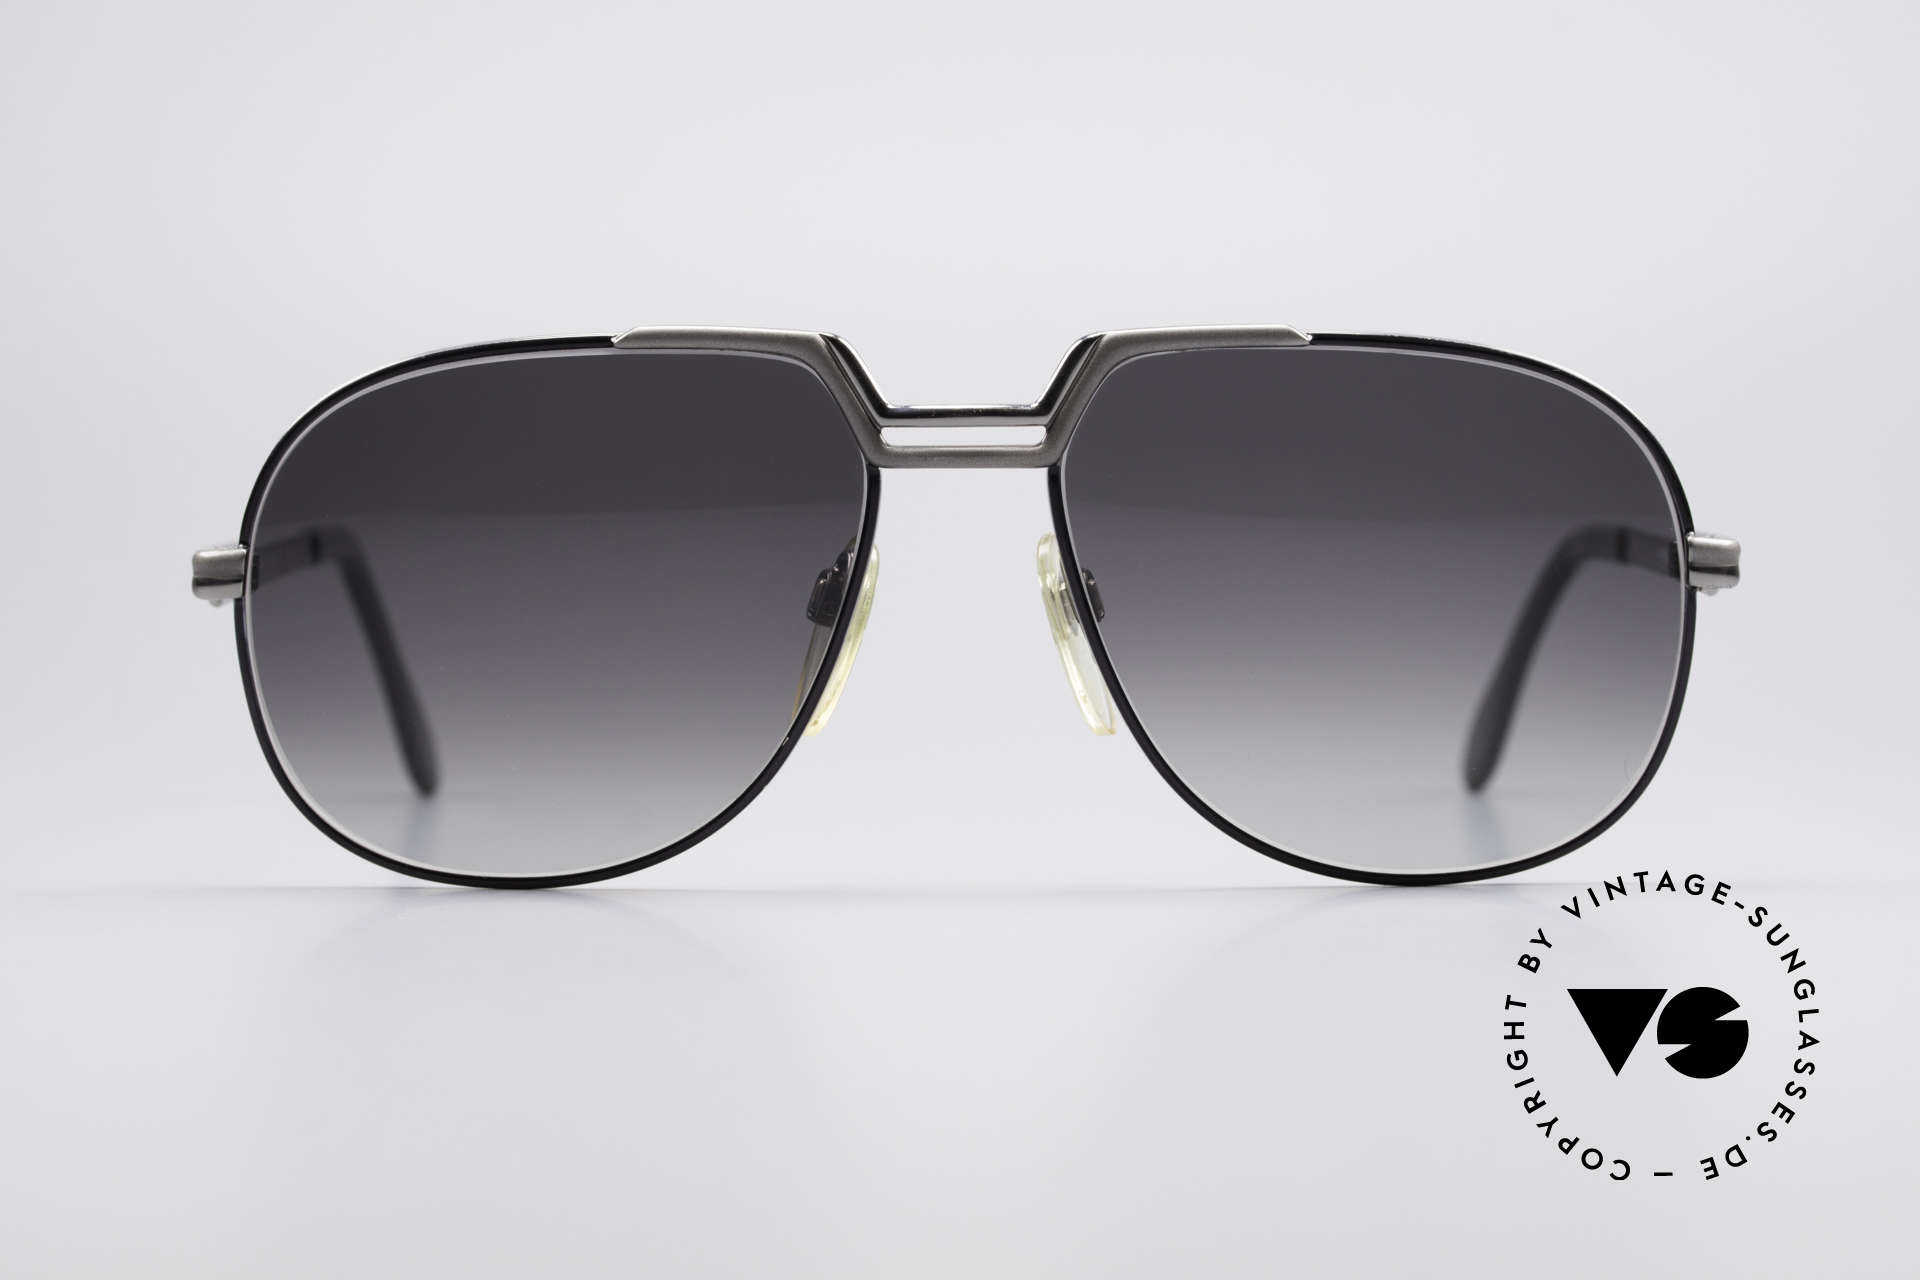 0fdadcdfae2c Sunglasses Cazal 710 Ultra Rare 80 s Sunglasses